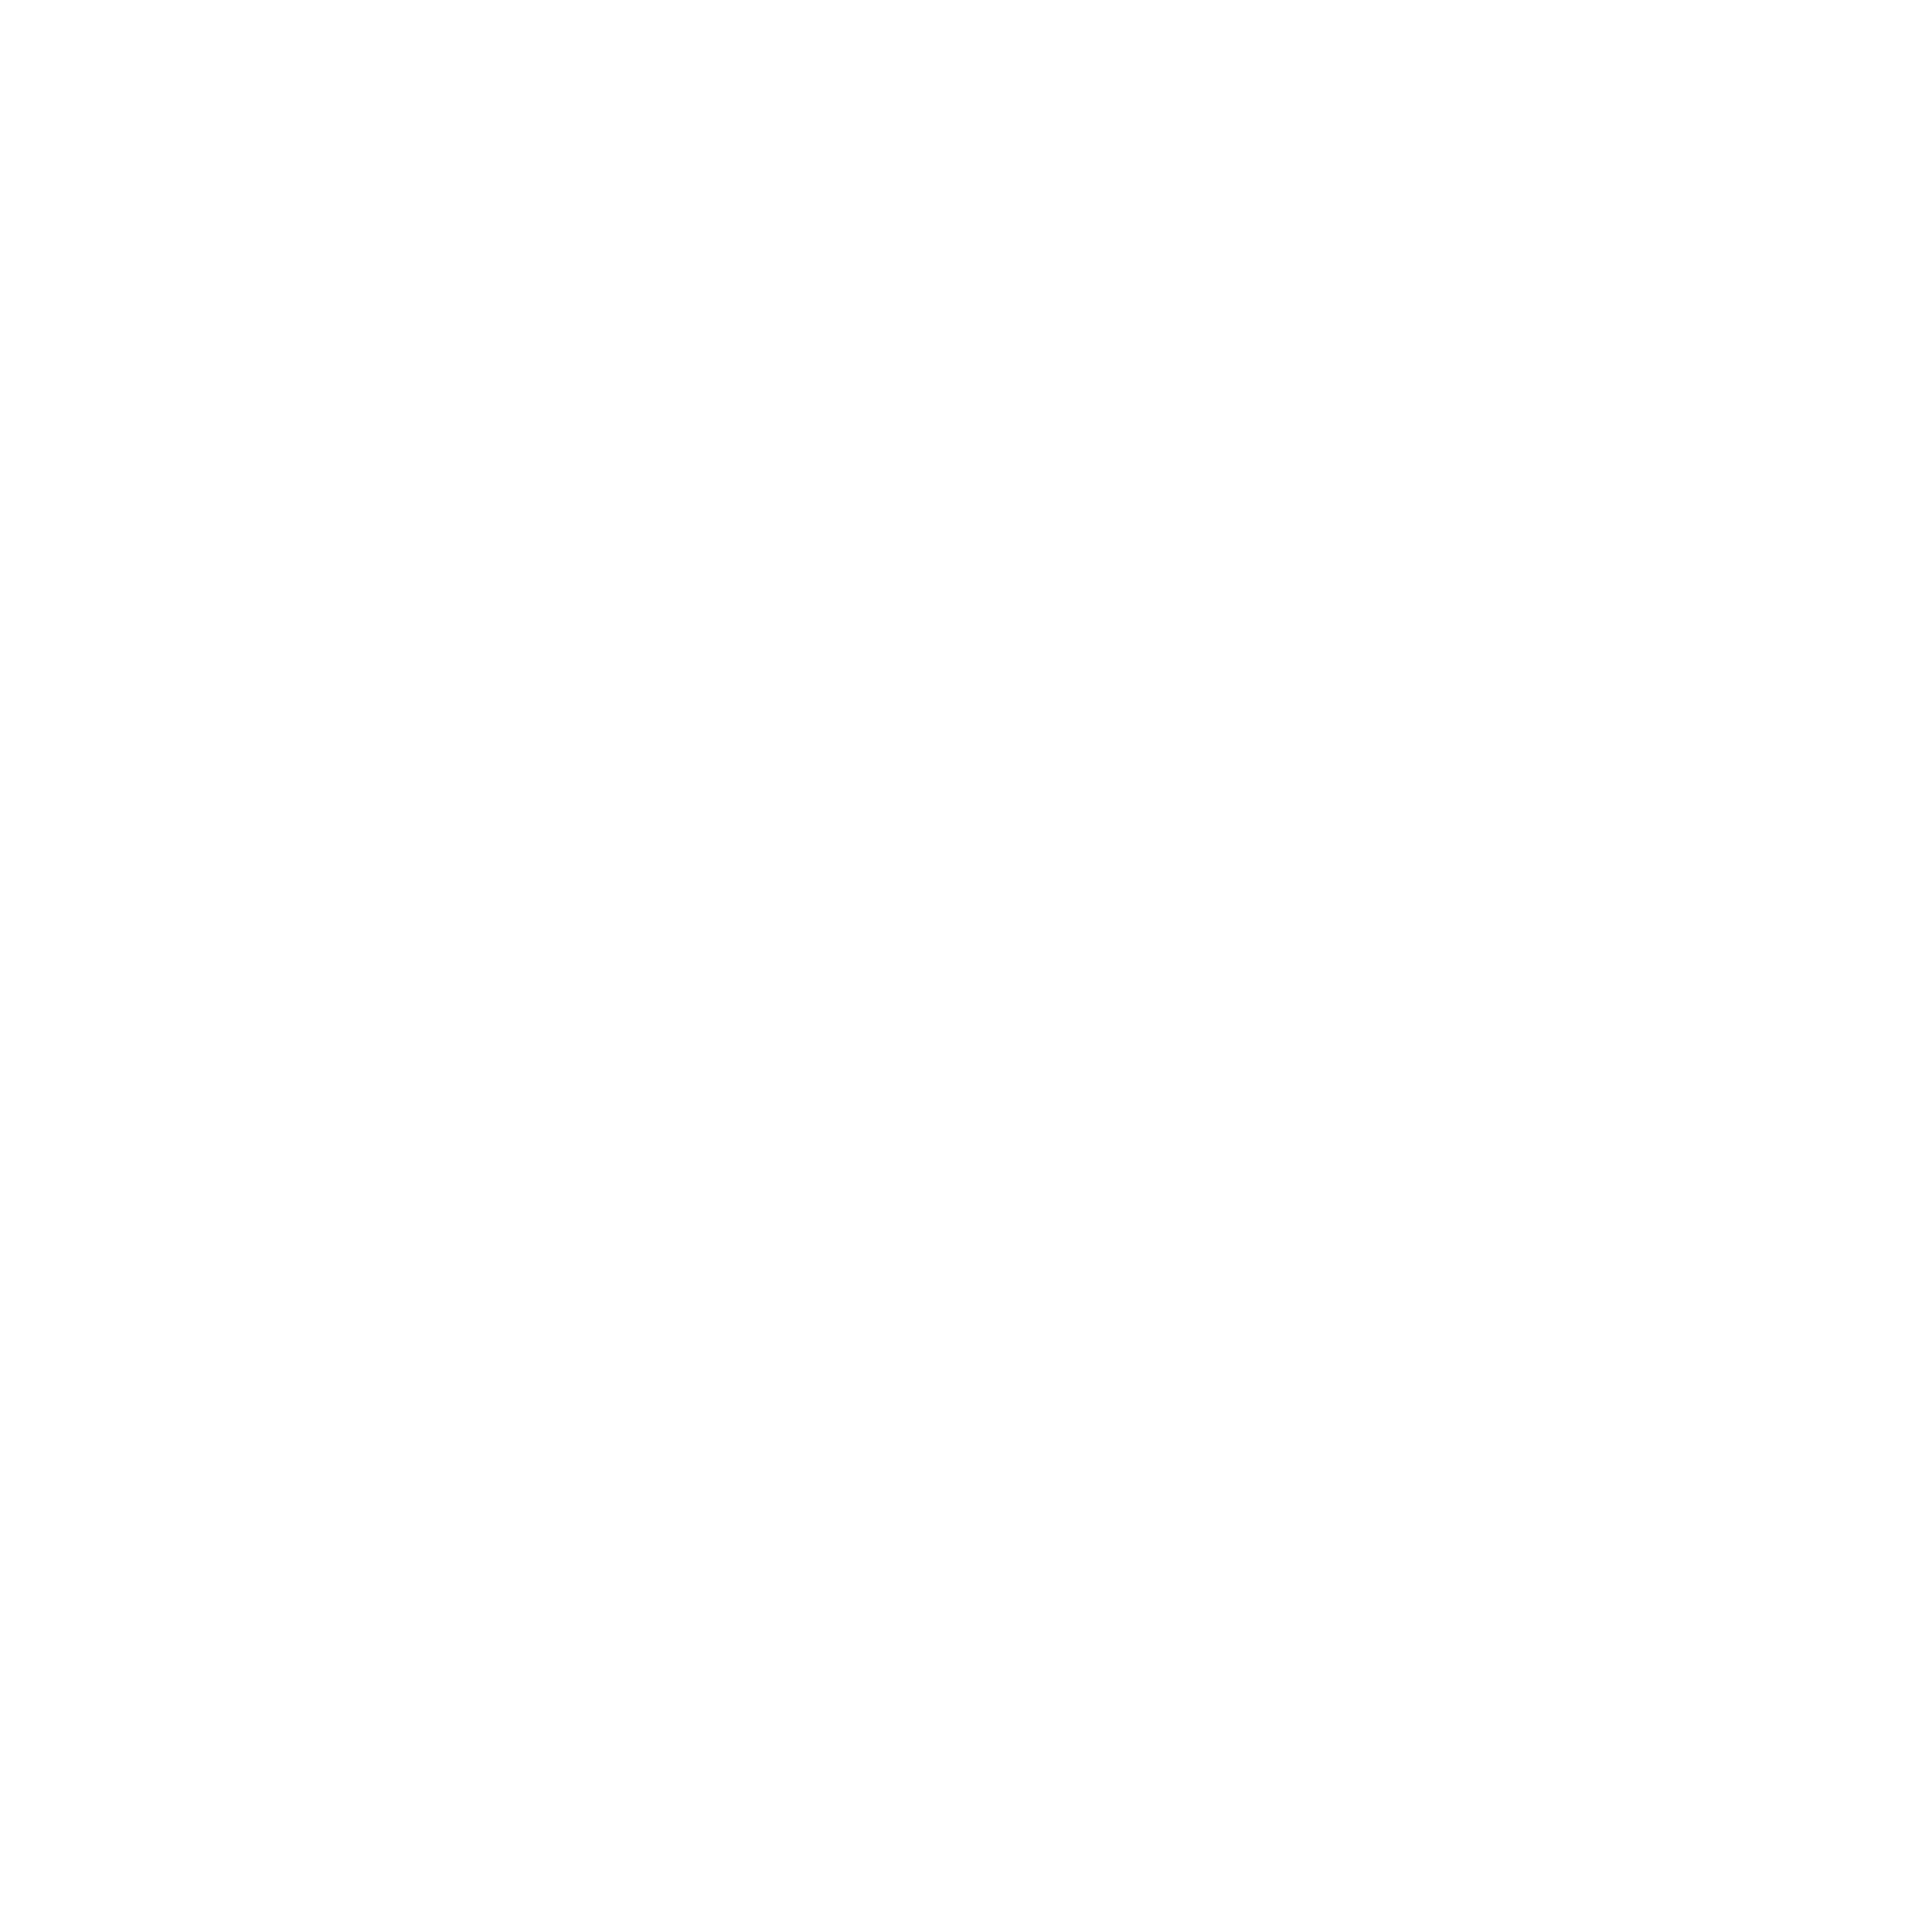 Muslim Response Group